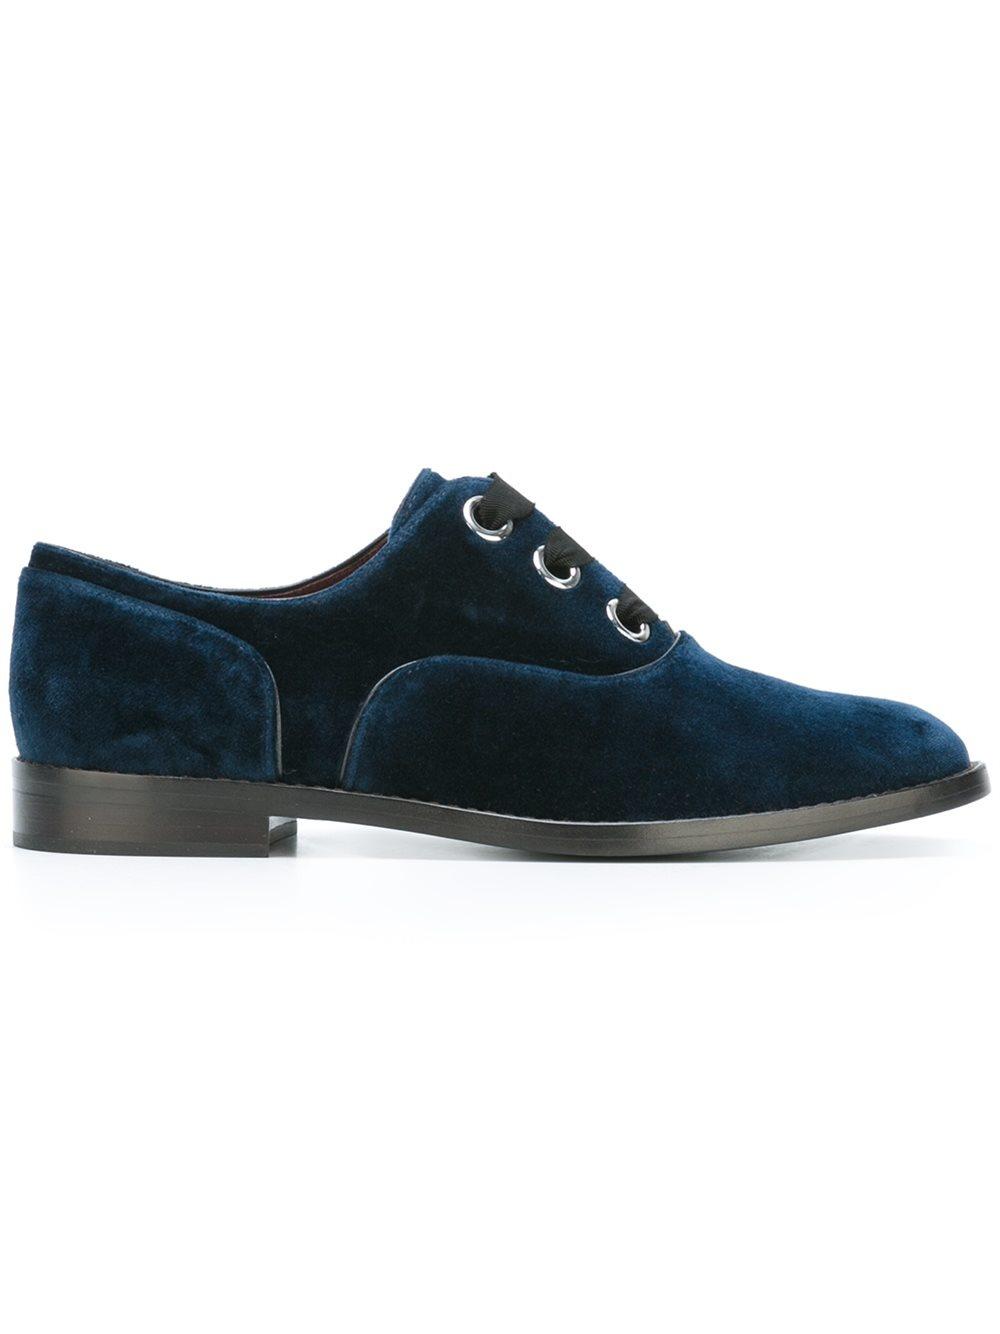 Lyst - Marc Jacobs - Velvet Oxford Shoes - Women - Leather ...